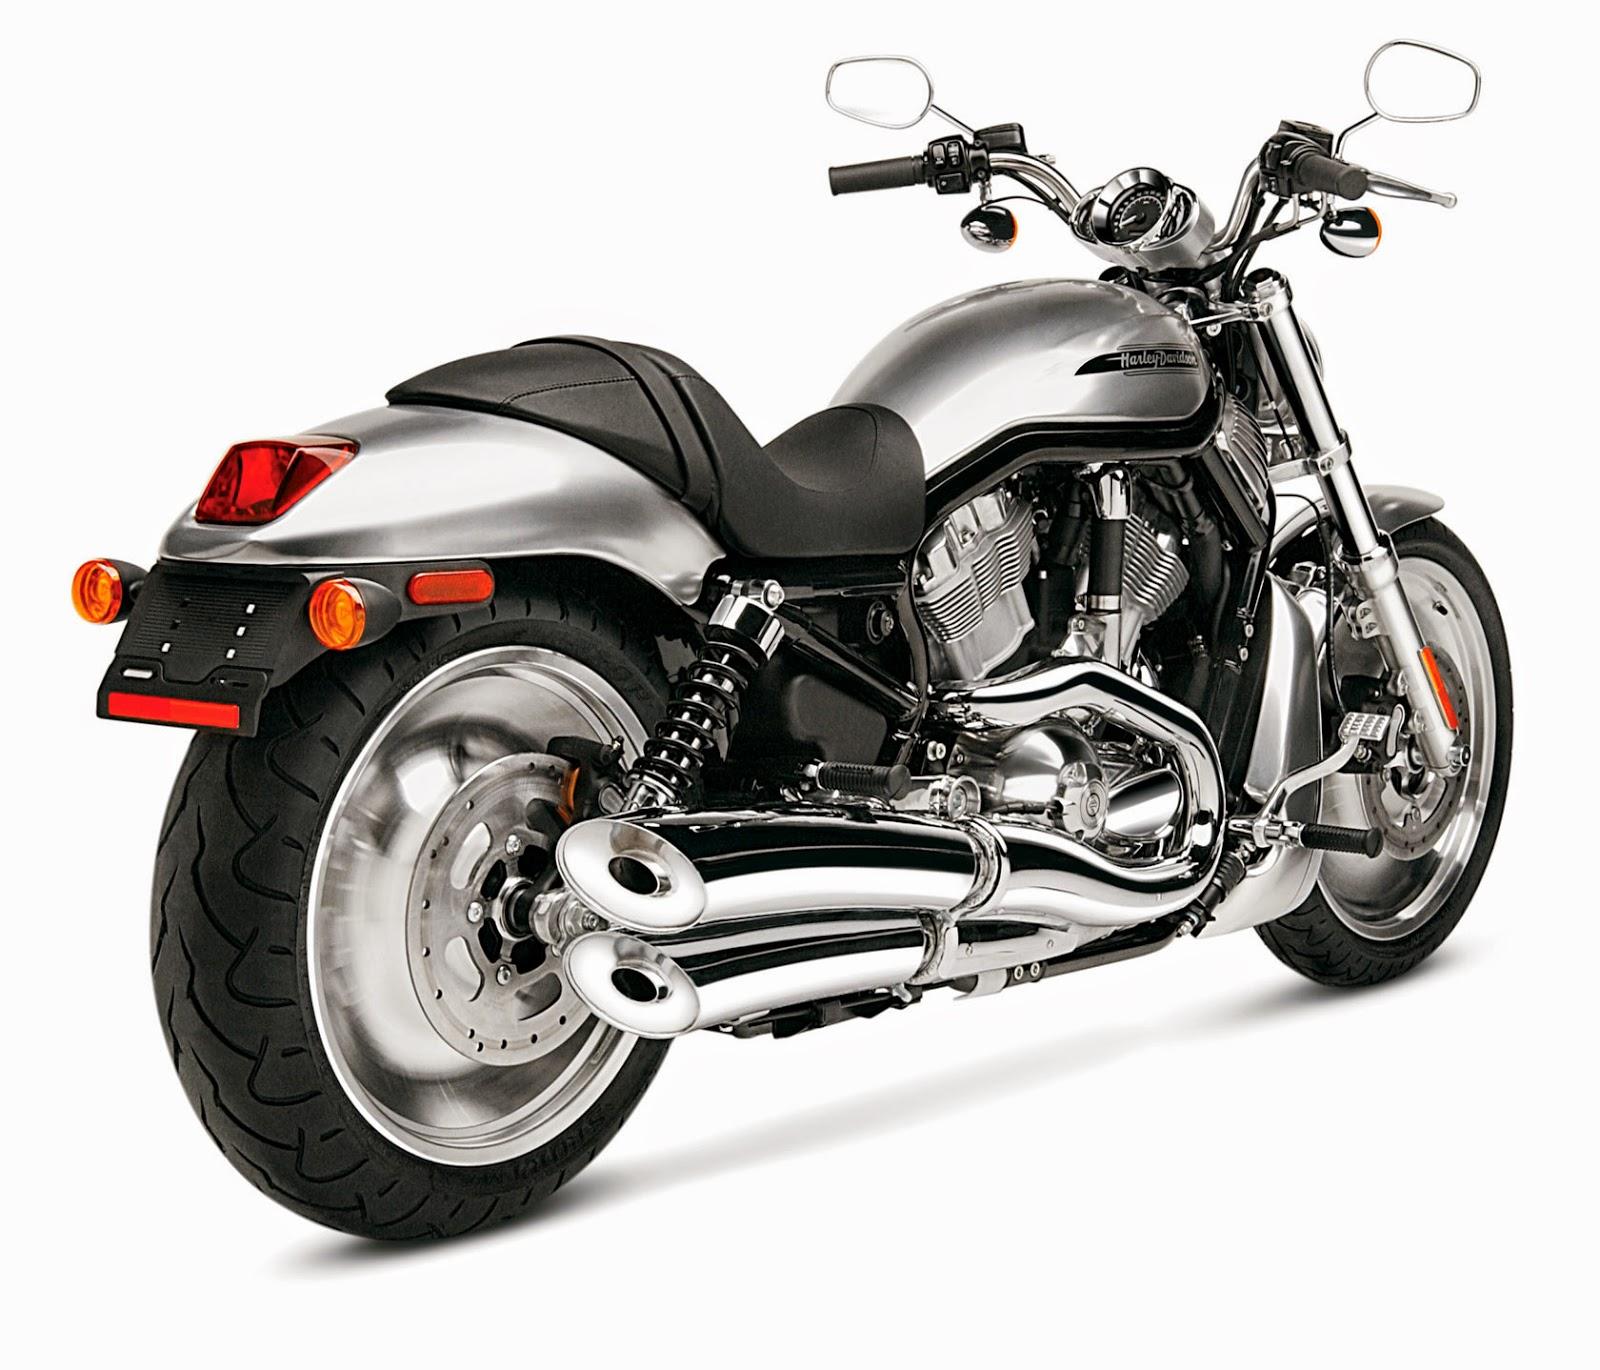 Harley-Davidson VRSCA VRSCB Workshop Service Repair Manual 2004 Download  Content: Service Repair Workshop Manual File type: PDFs zipped ( open  maintoc.pdf ...